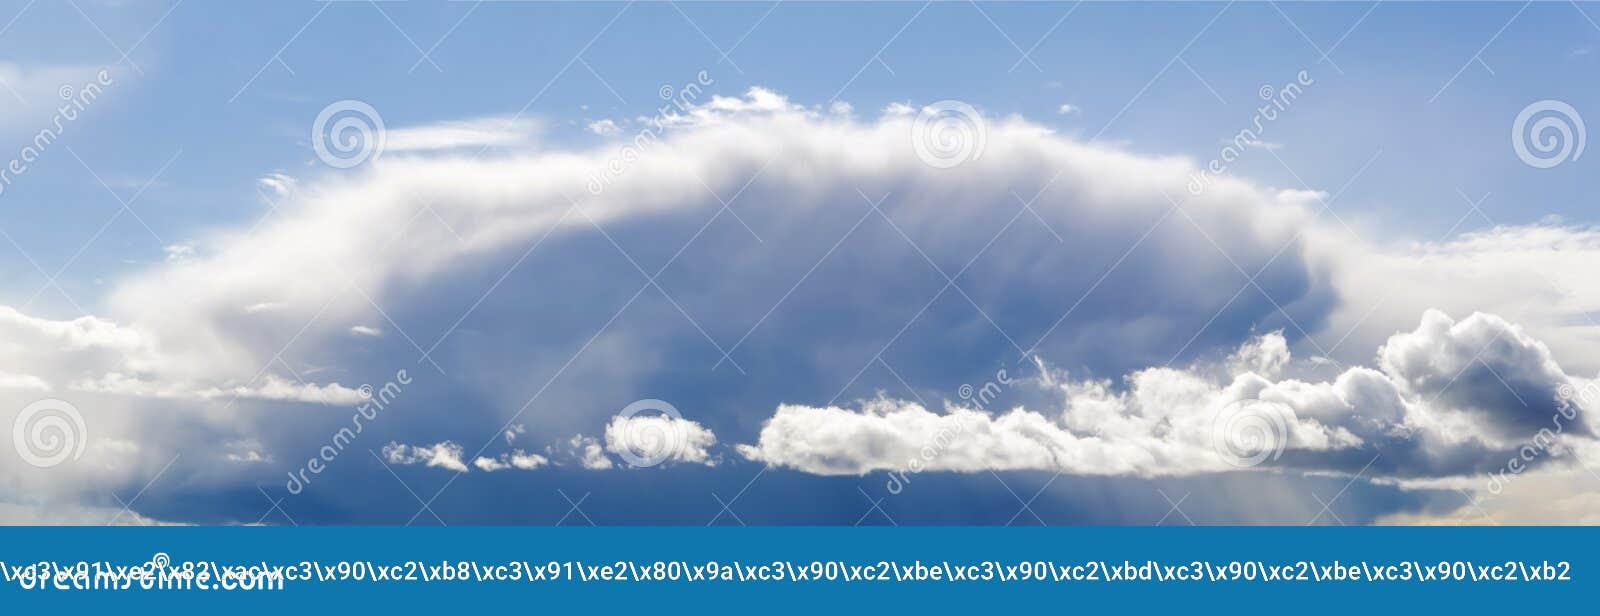 Grand nuage avant un orage